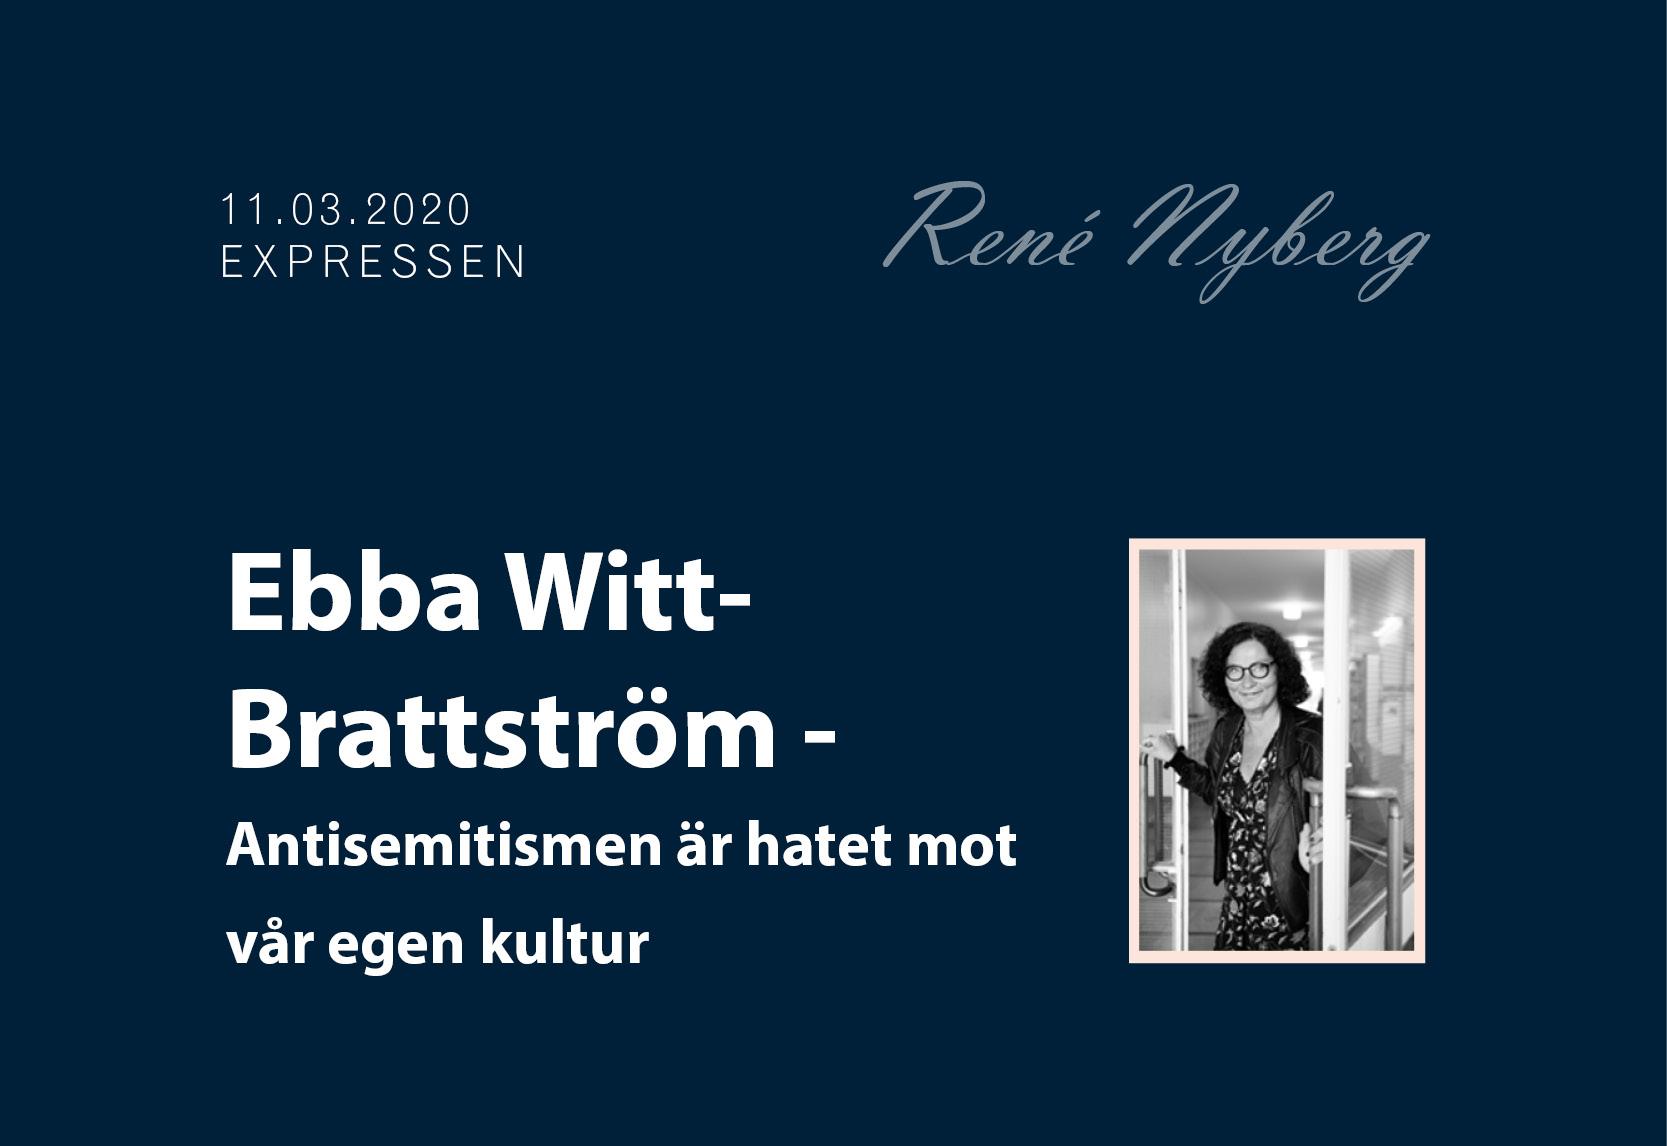 Antisemitismen är hatet mot vår egen kultur EBBA WITT-BRATTSTRÖM